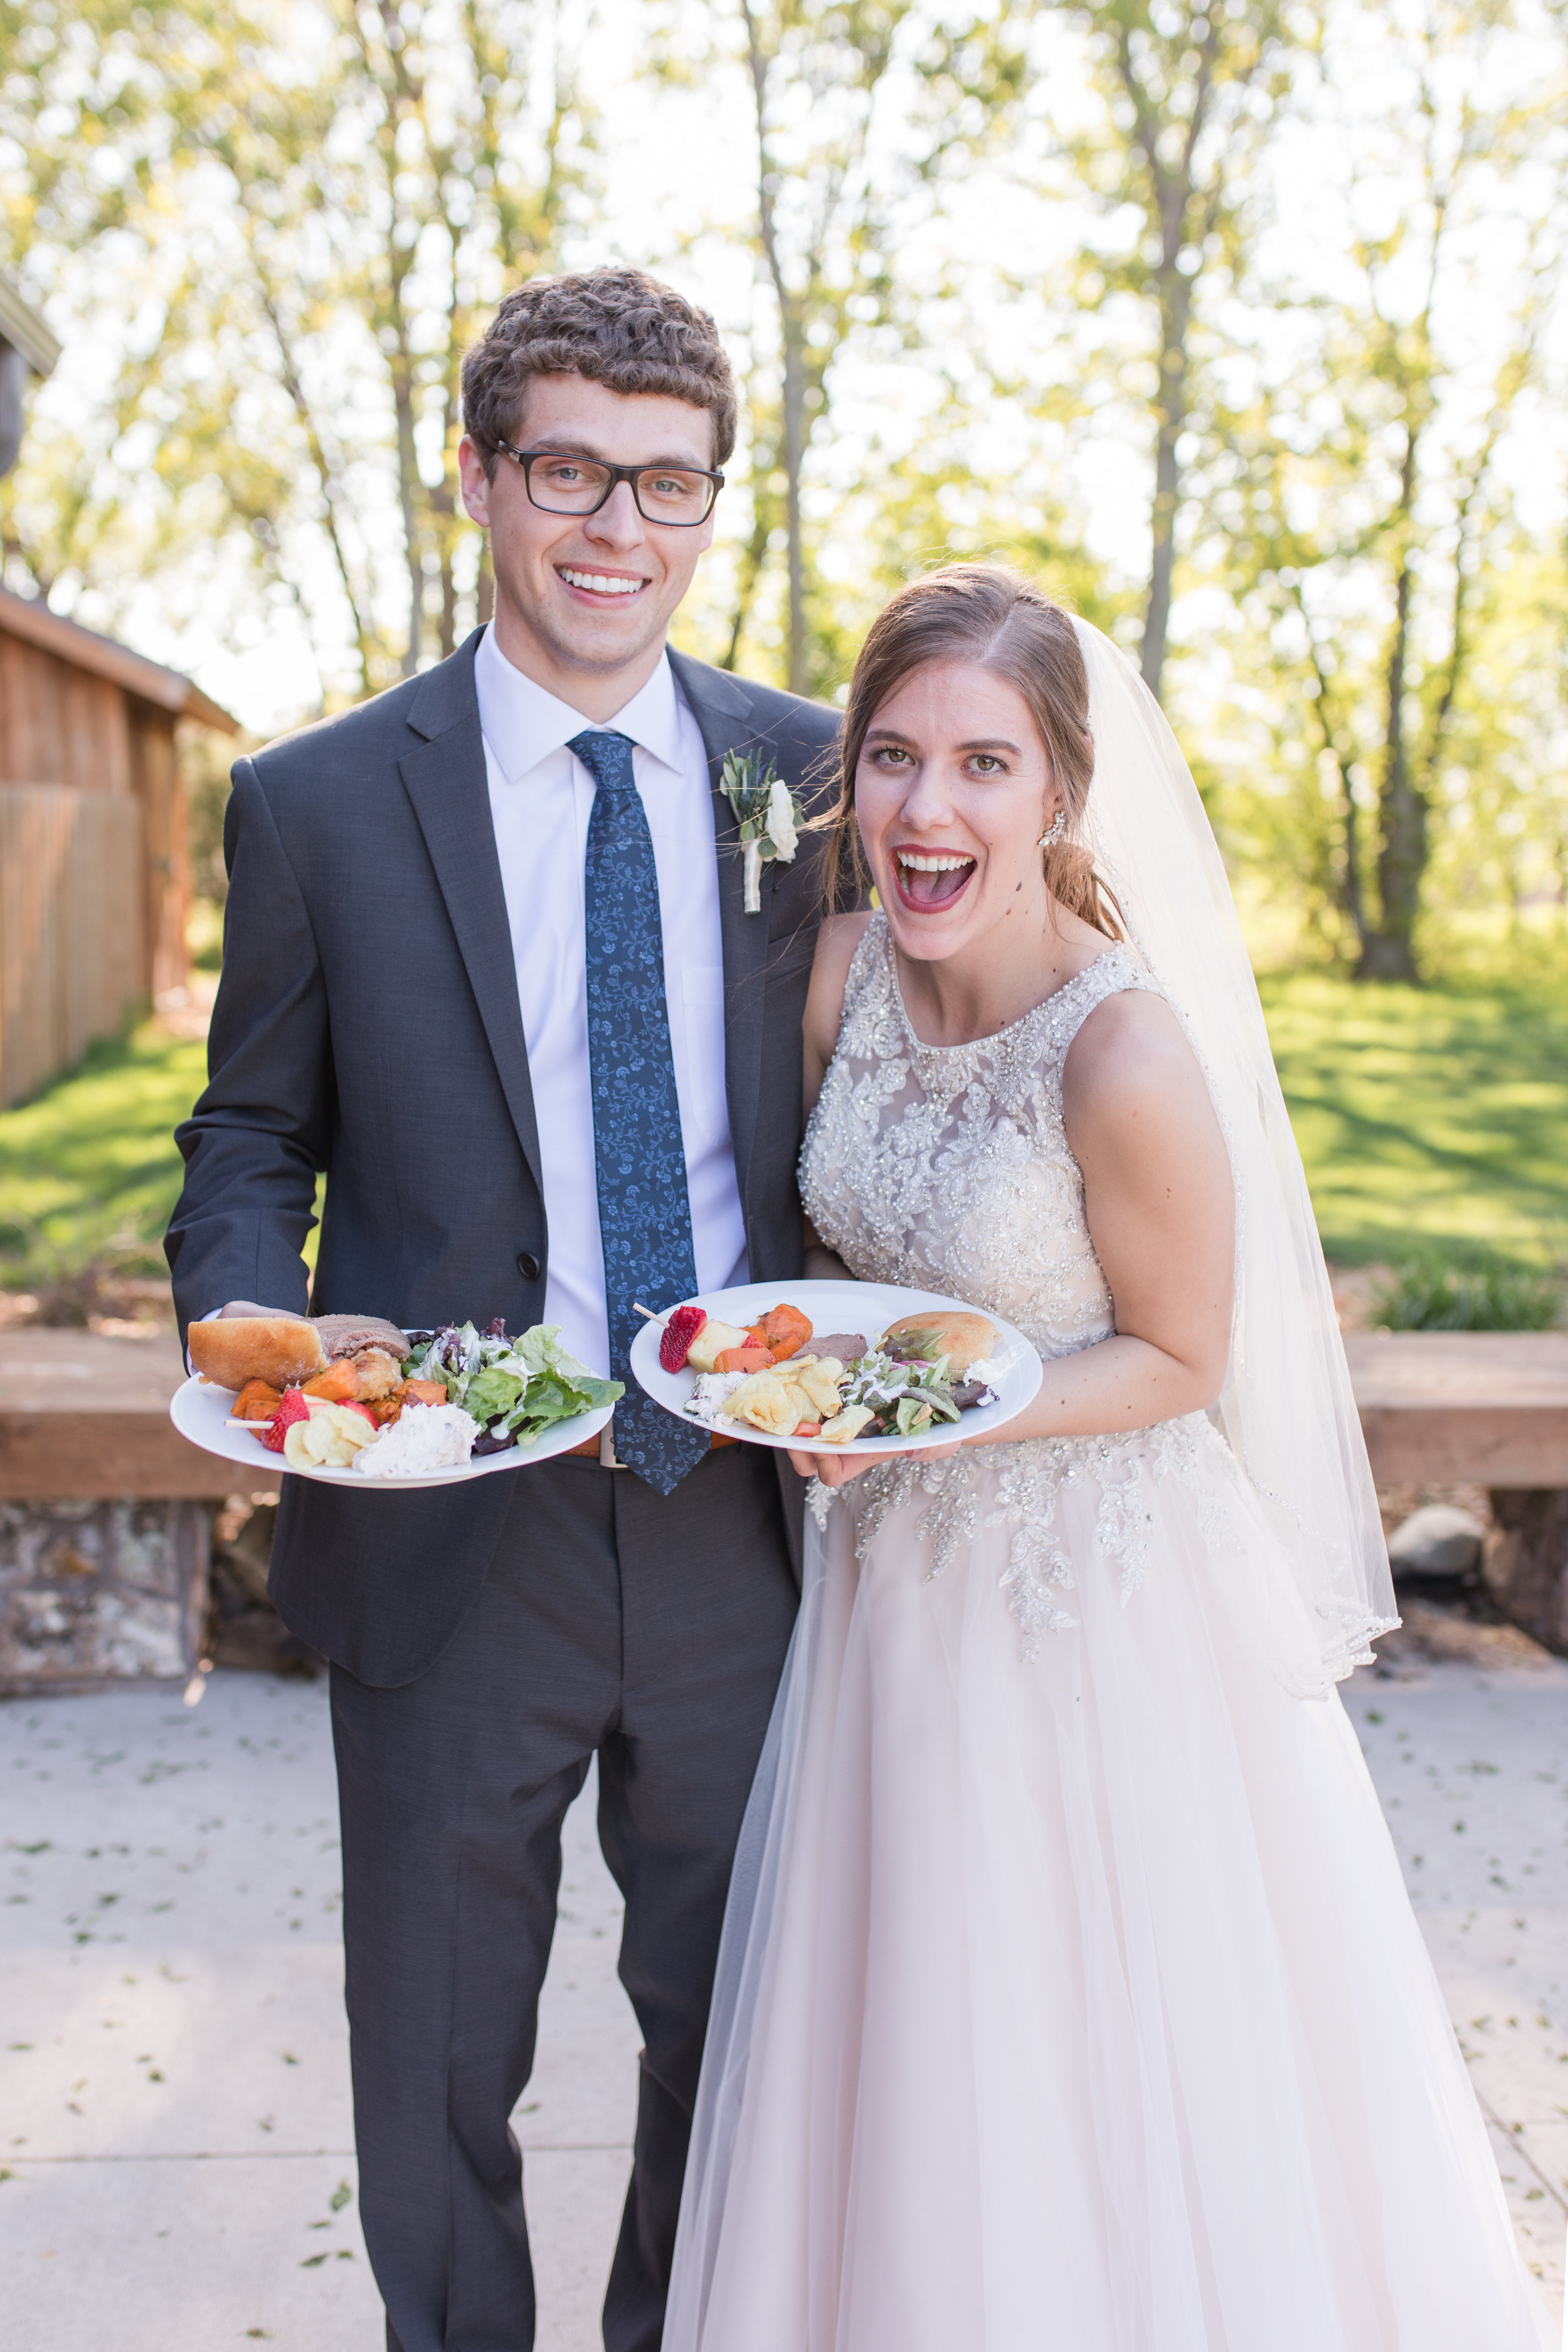 WeddingReceptionChefDominiques